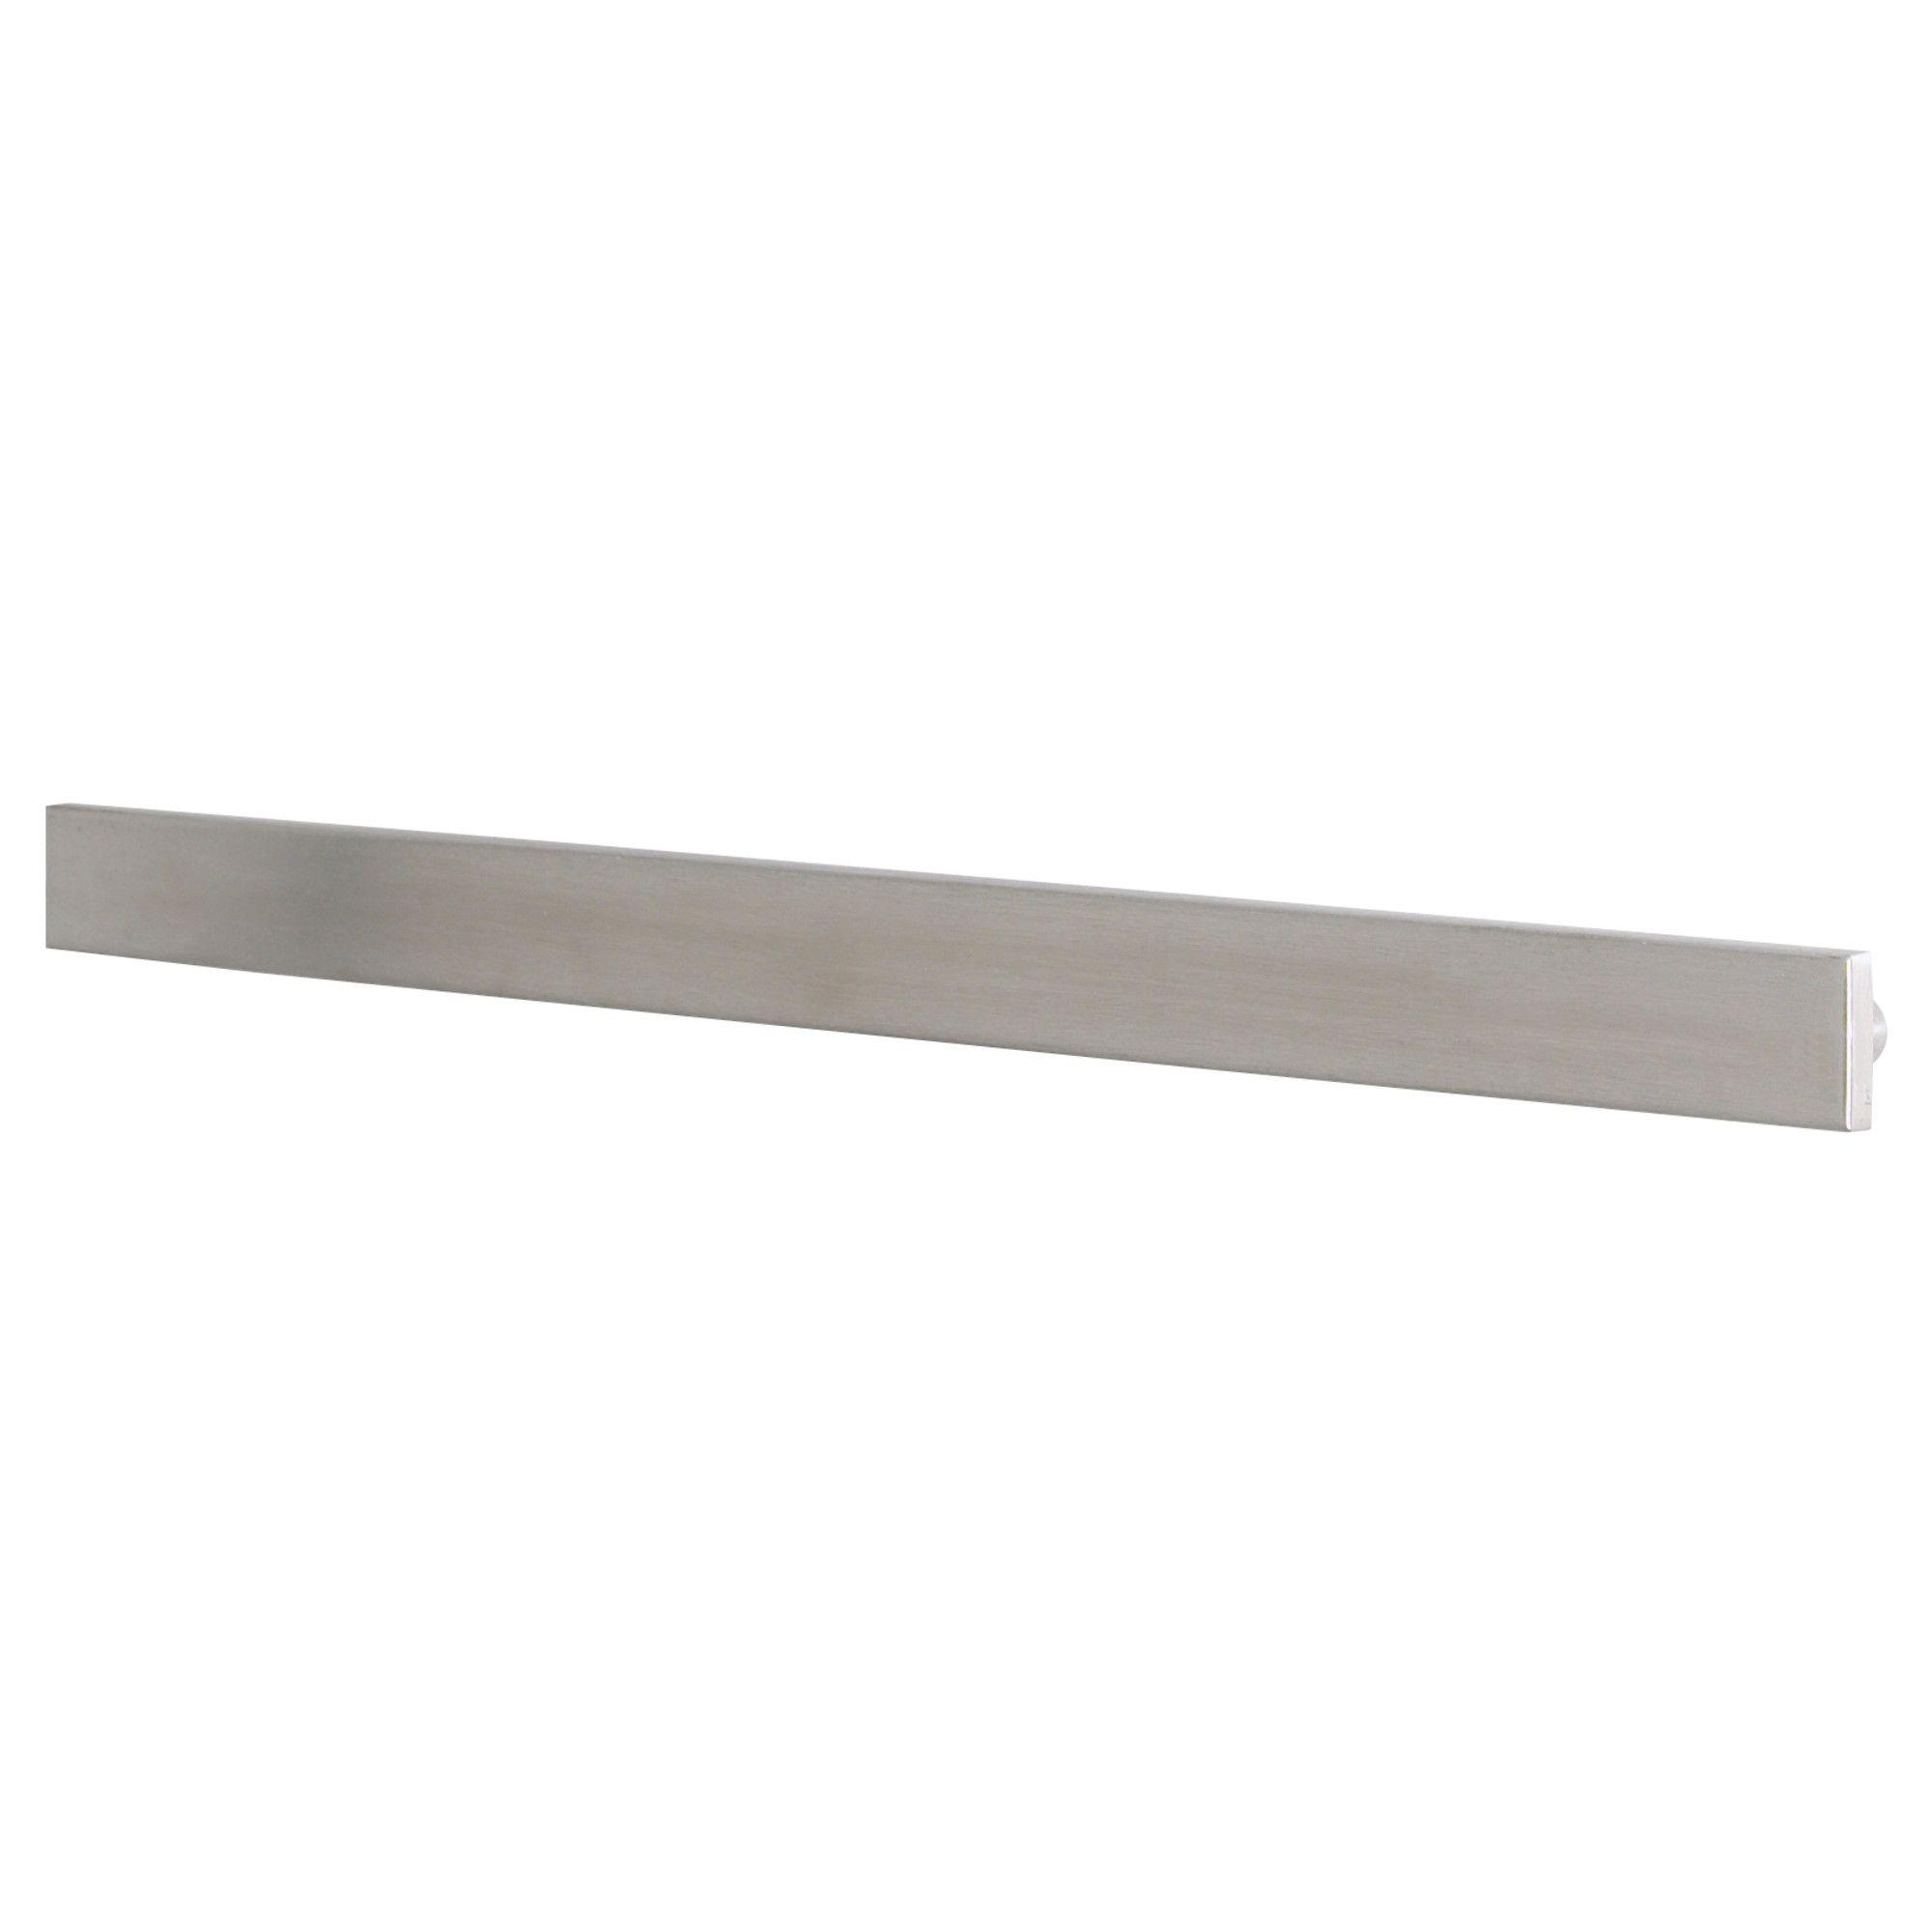 grundtal magnetic knife rack ikea i saw the idea of storing knives on a magnetic strip on a. Black Bedroom Furniture Sets. Home Design Ideas